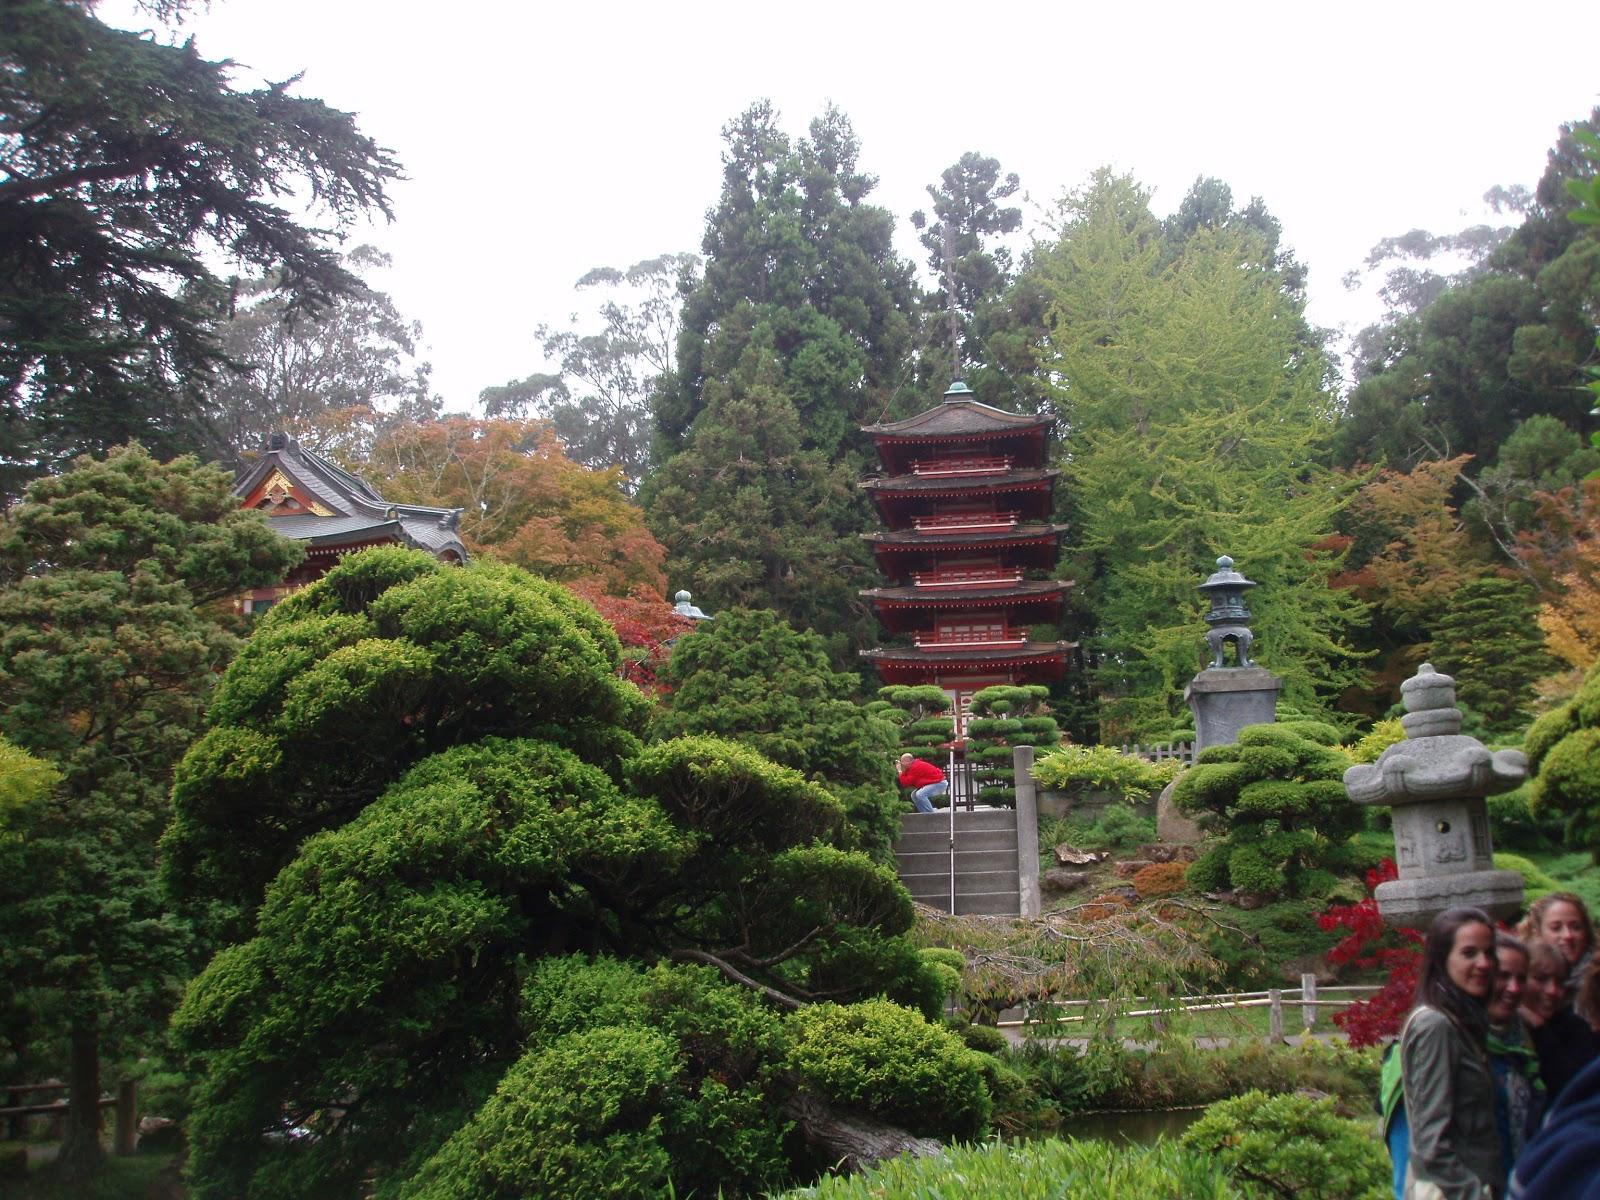 San francisco l a las vegas dia 3 jardin japones for Jardin estilo japones